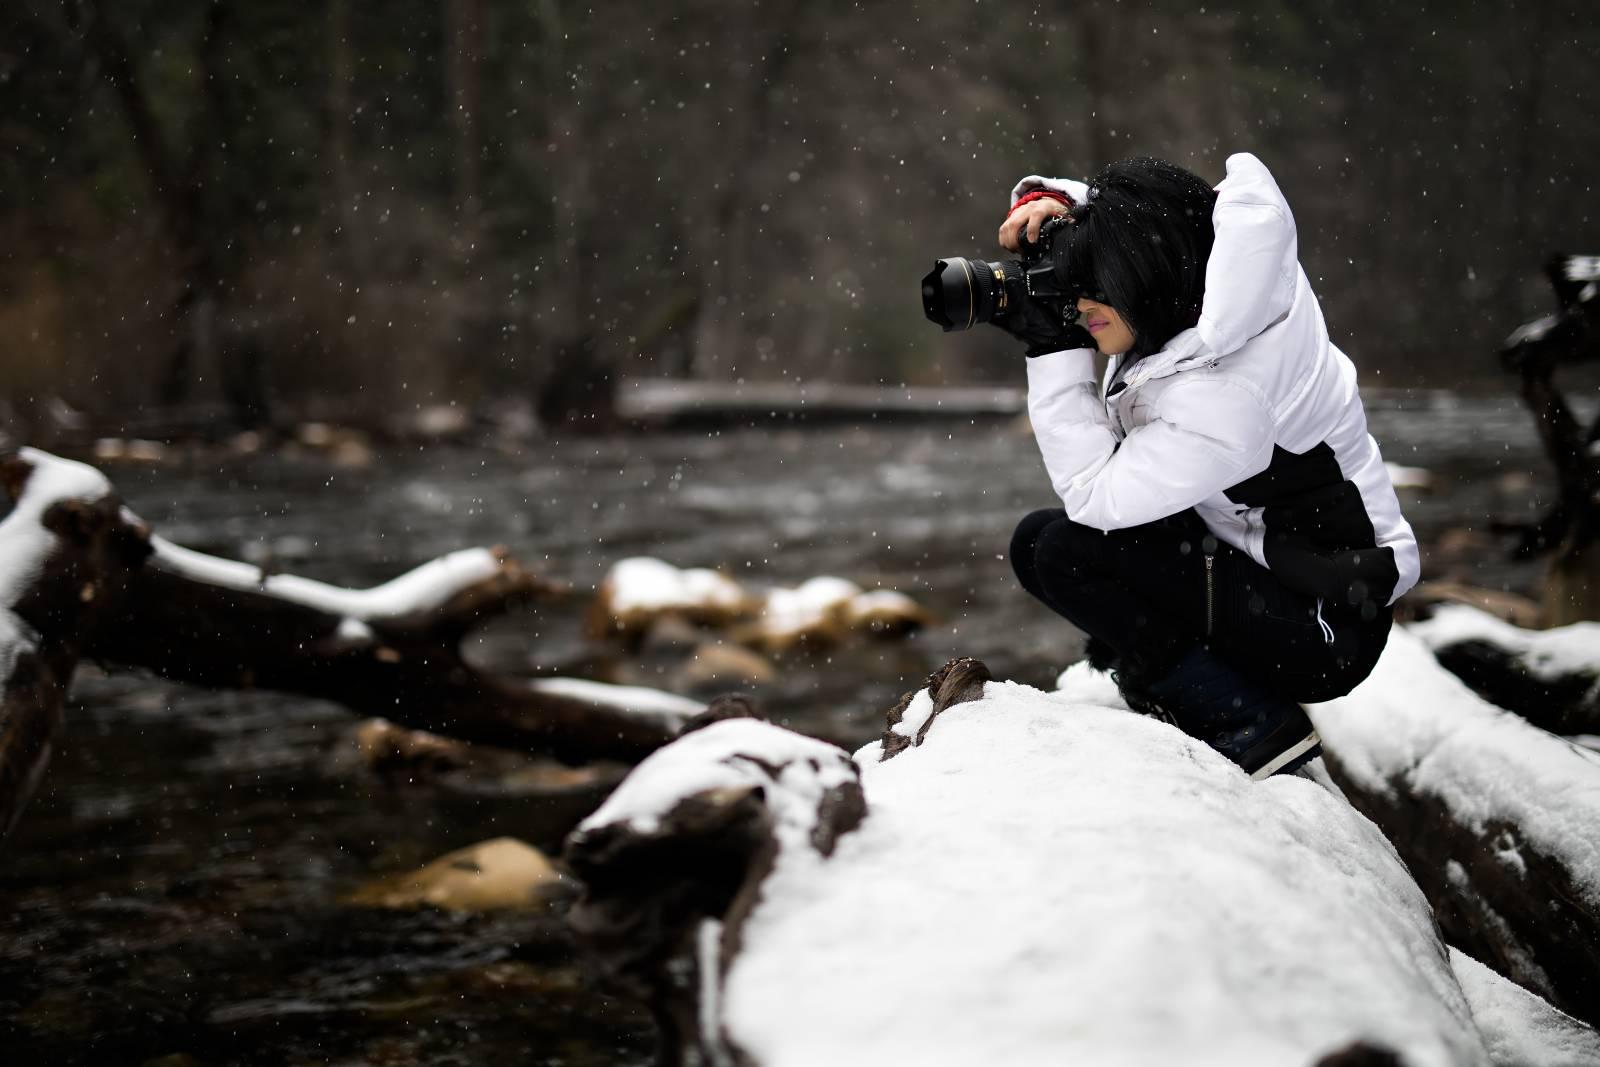 Recursos para fotografía de exteriores